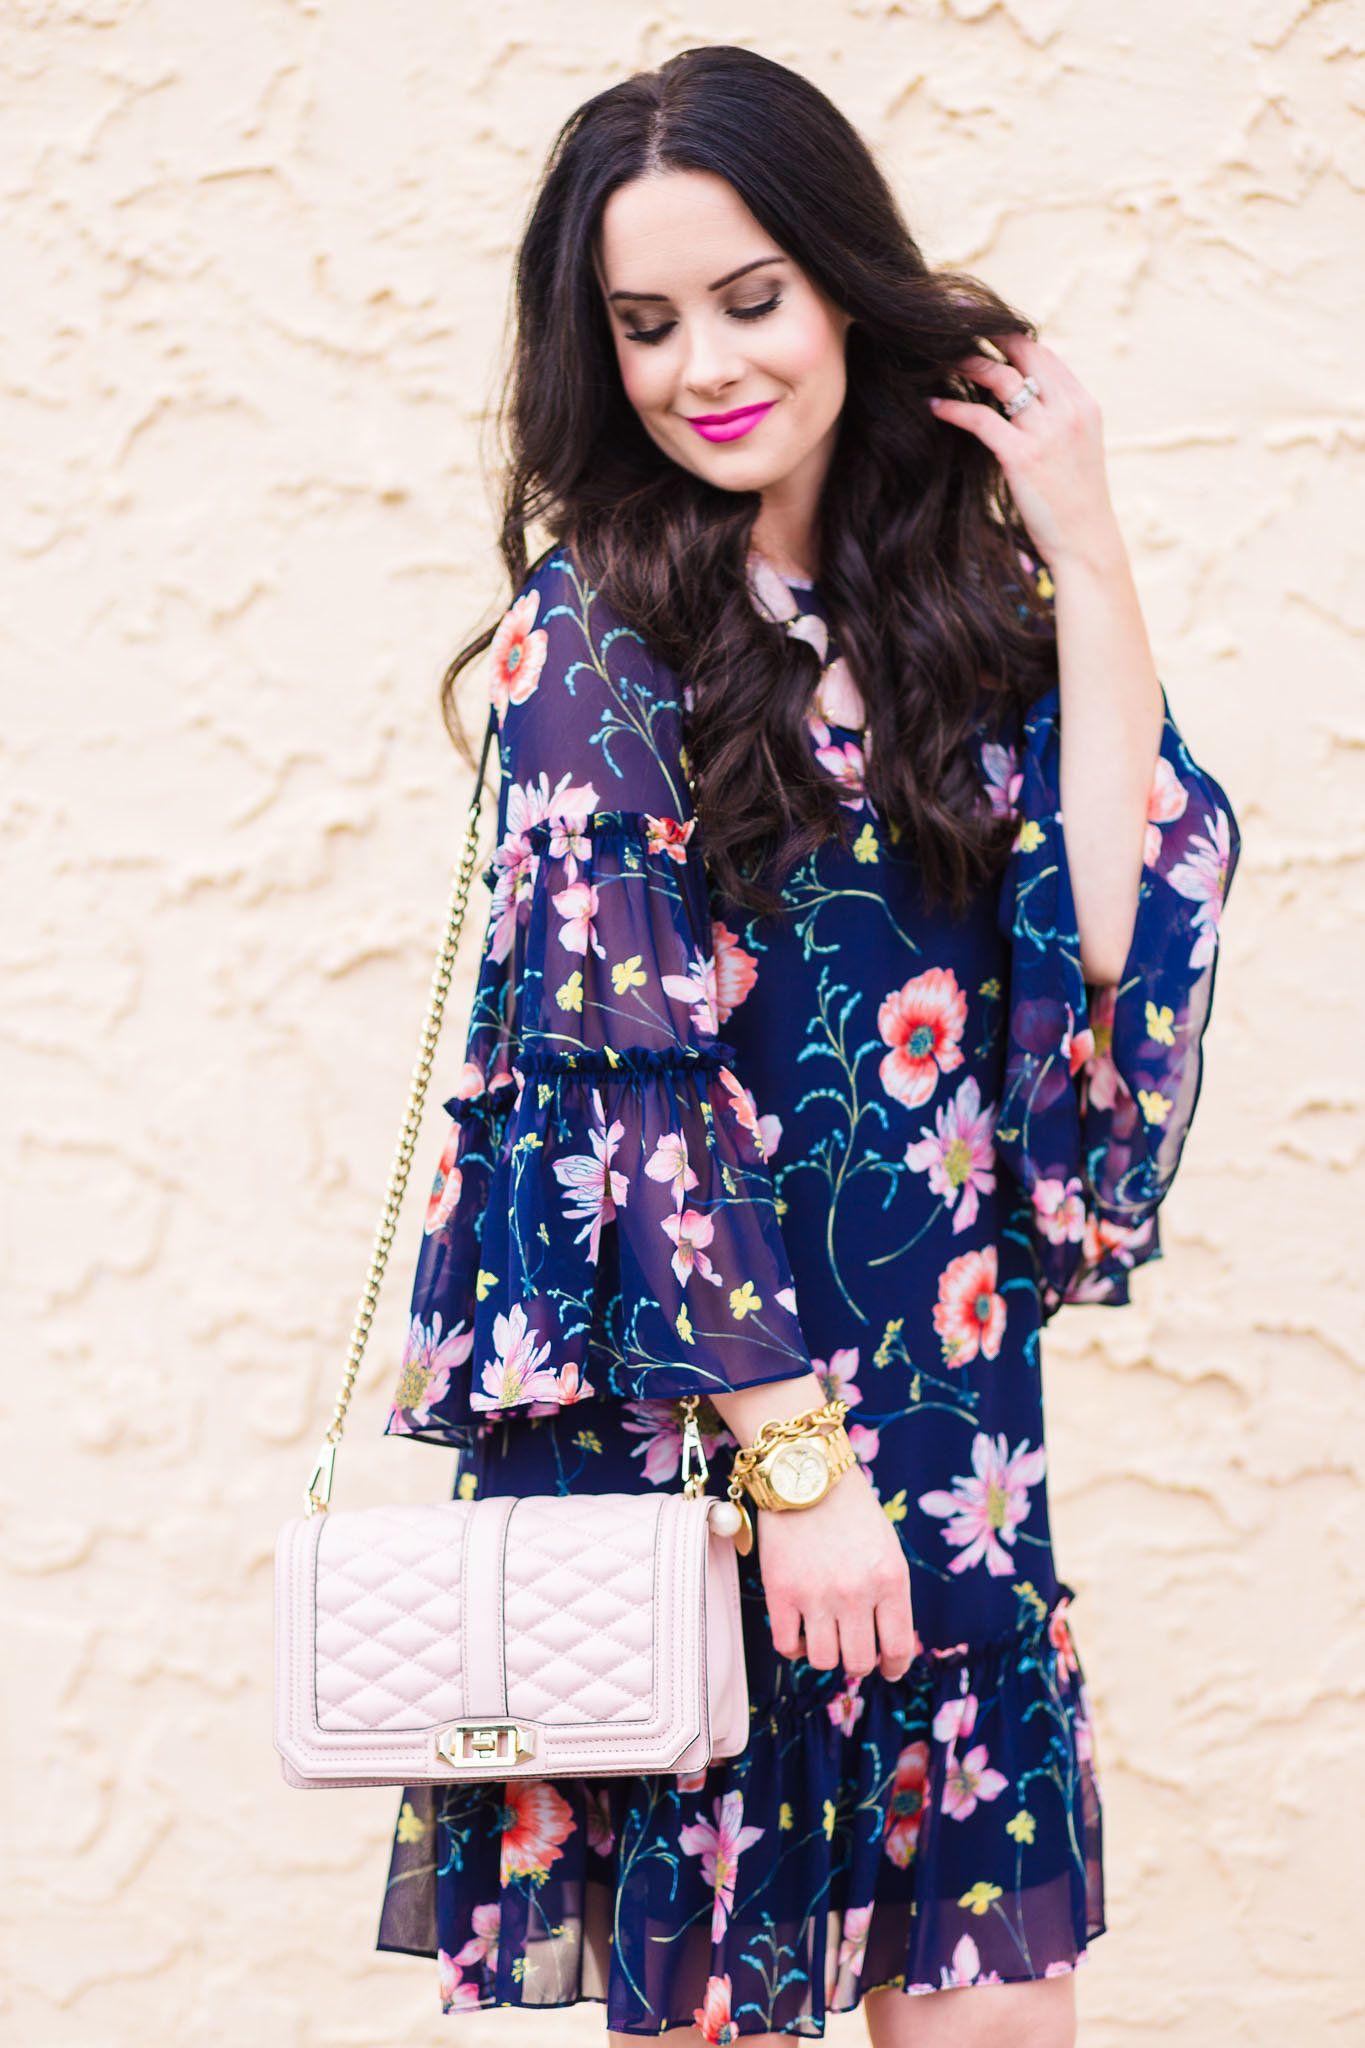 Favorite Easter Dresses Roundup The Double Take Girls Easter Dress Dresses Girl Blog [ 2048 x 1365 Pixel ]